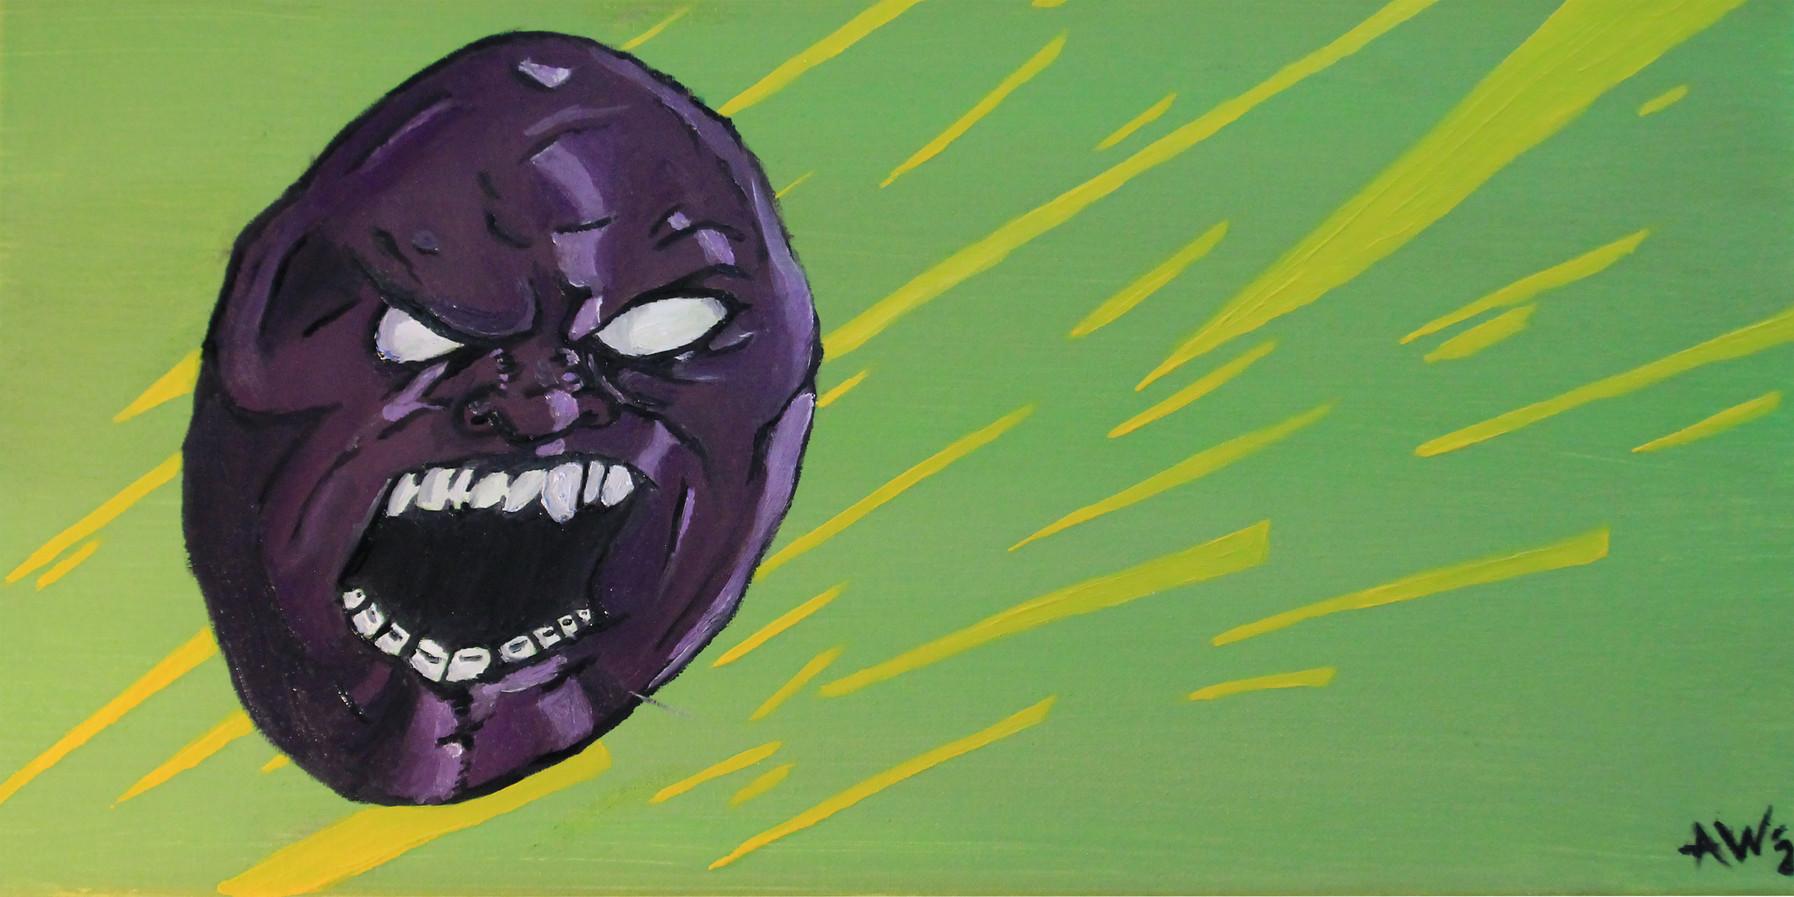 Grape of Wrath